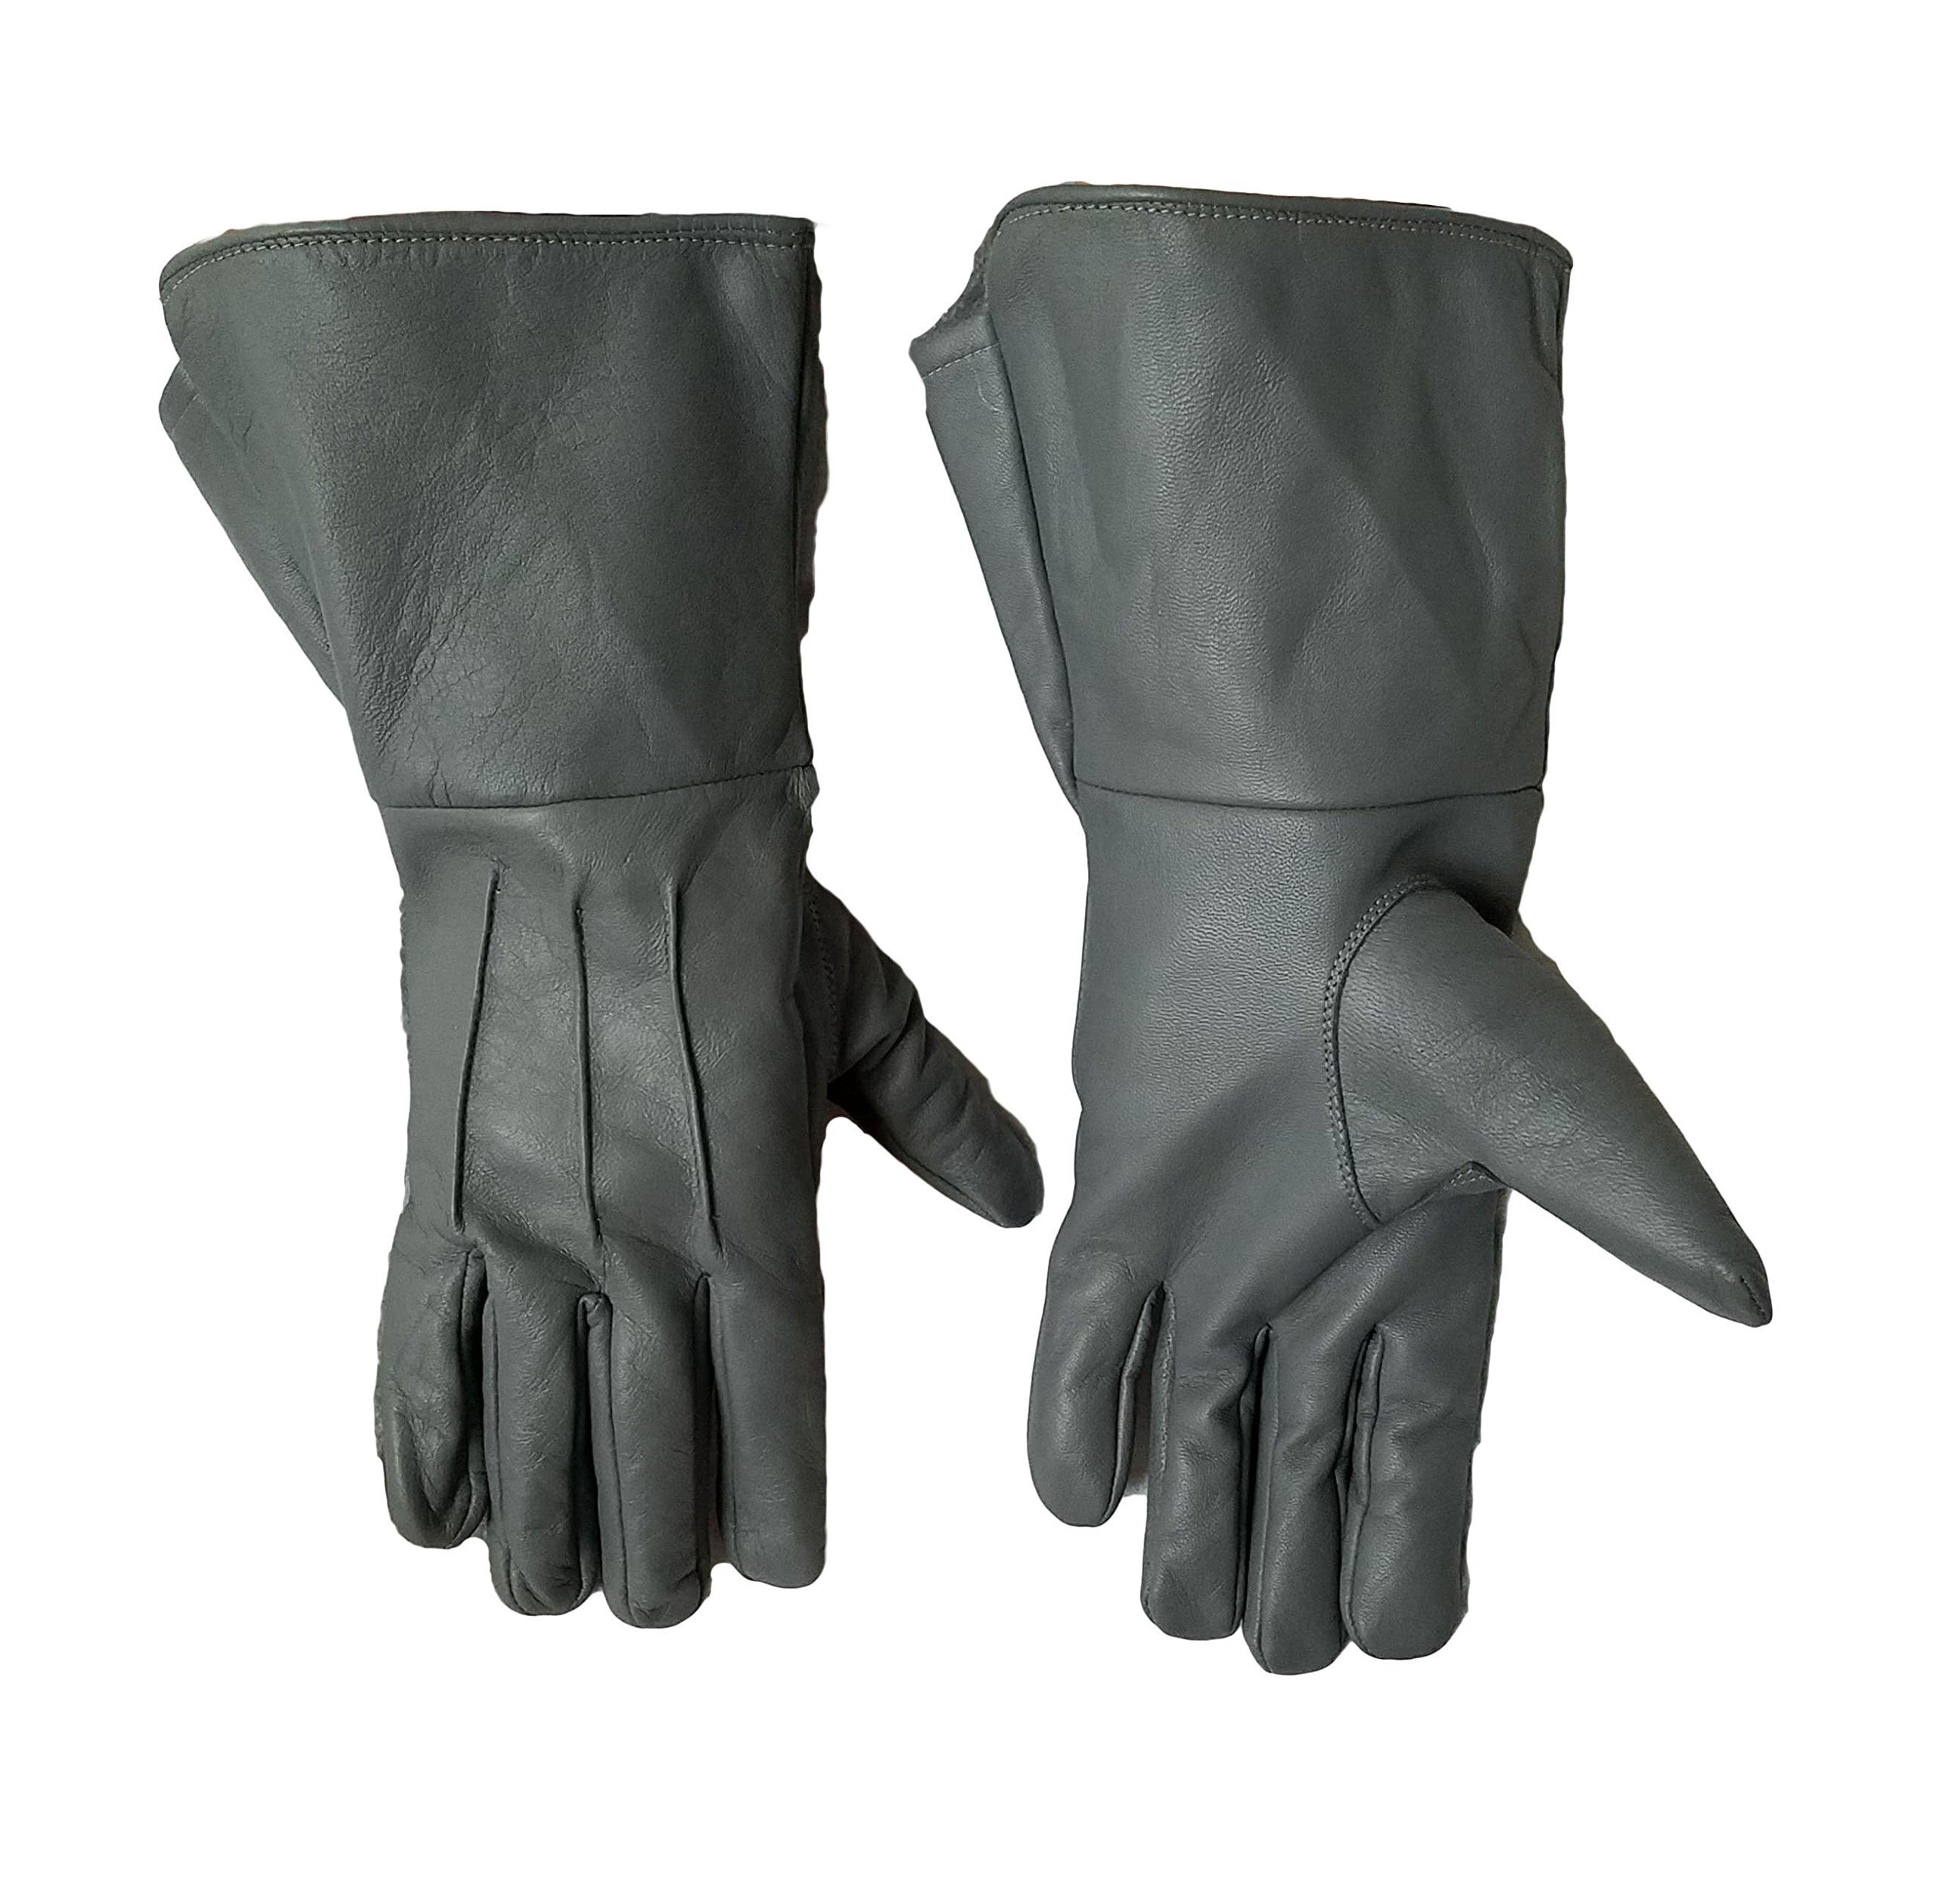 Grey Leather Medieval Renaissance gauntlet cosplay gloves (Medium)